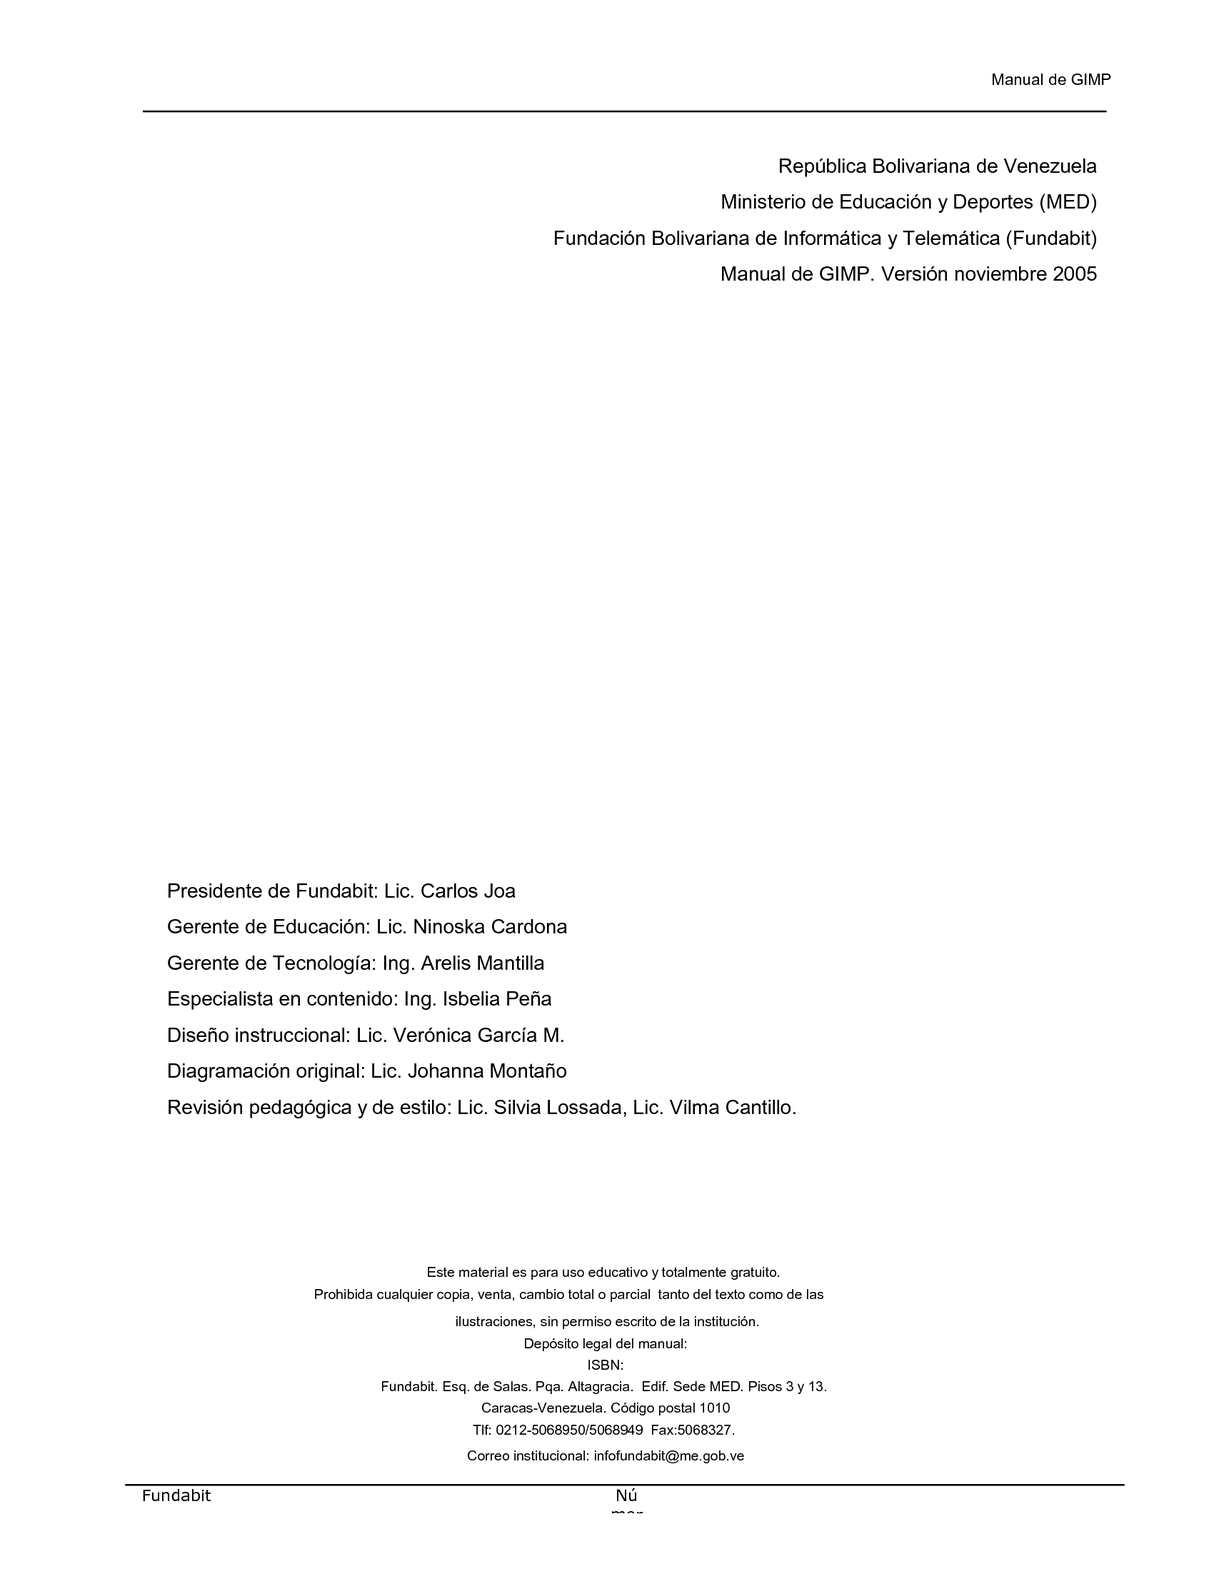 Manual GIMP - CALAMEO Downloader